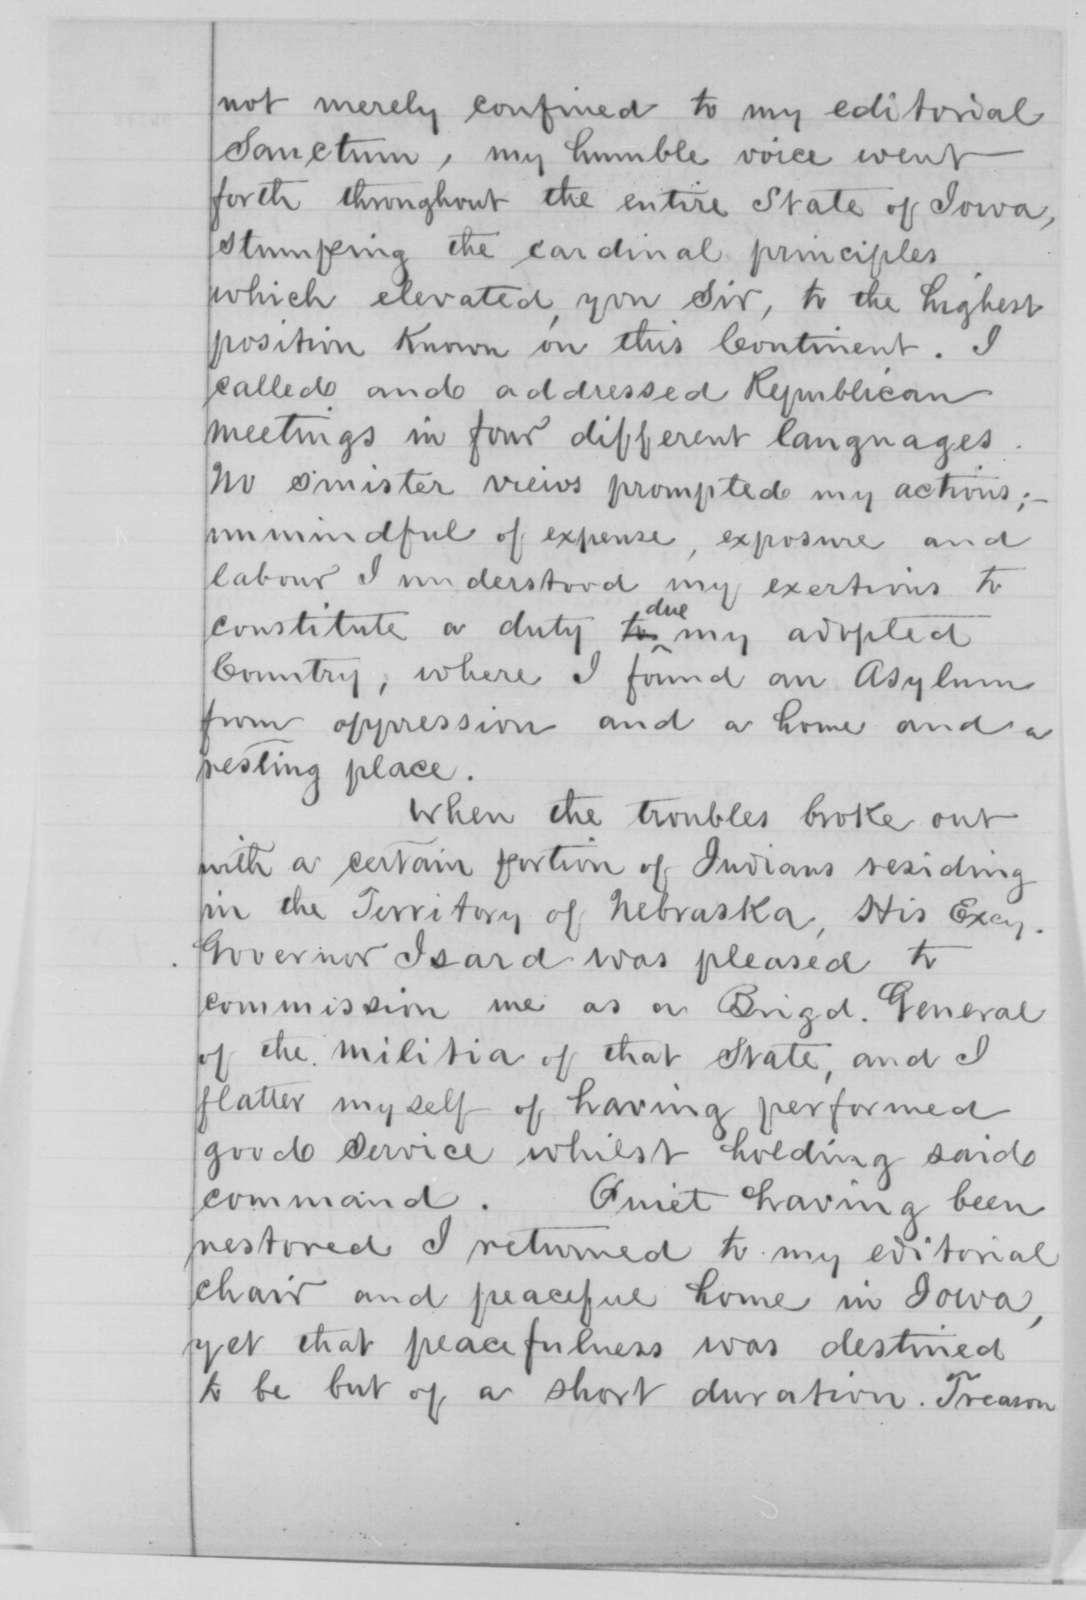 Emanuel J. Pleyel to Abraham Lincoln, Tuesday, March 22, 1864  (Seeks military commission)